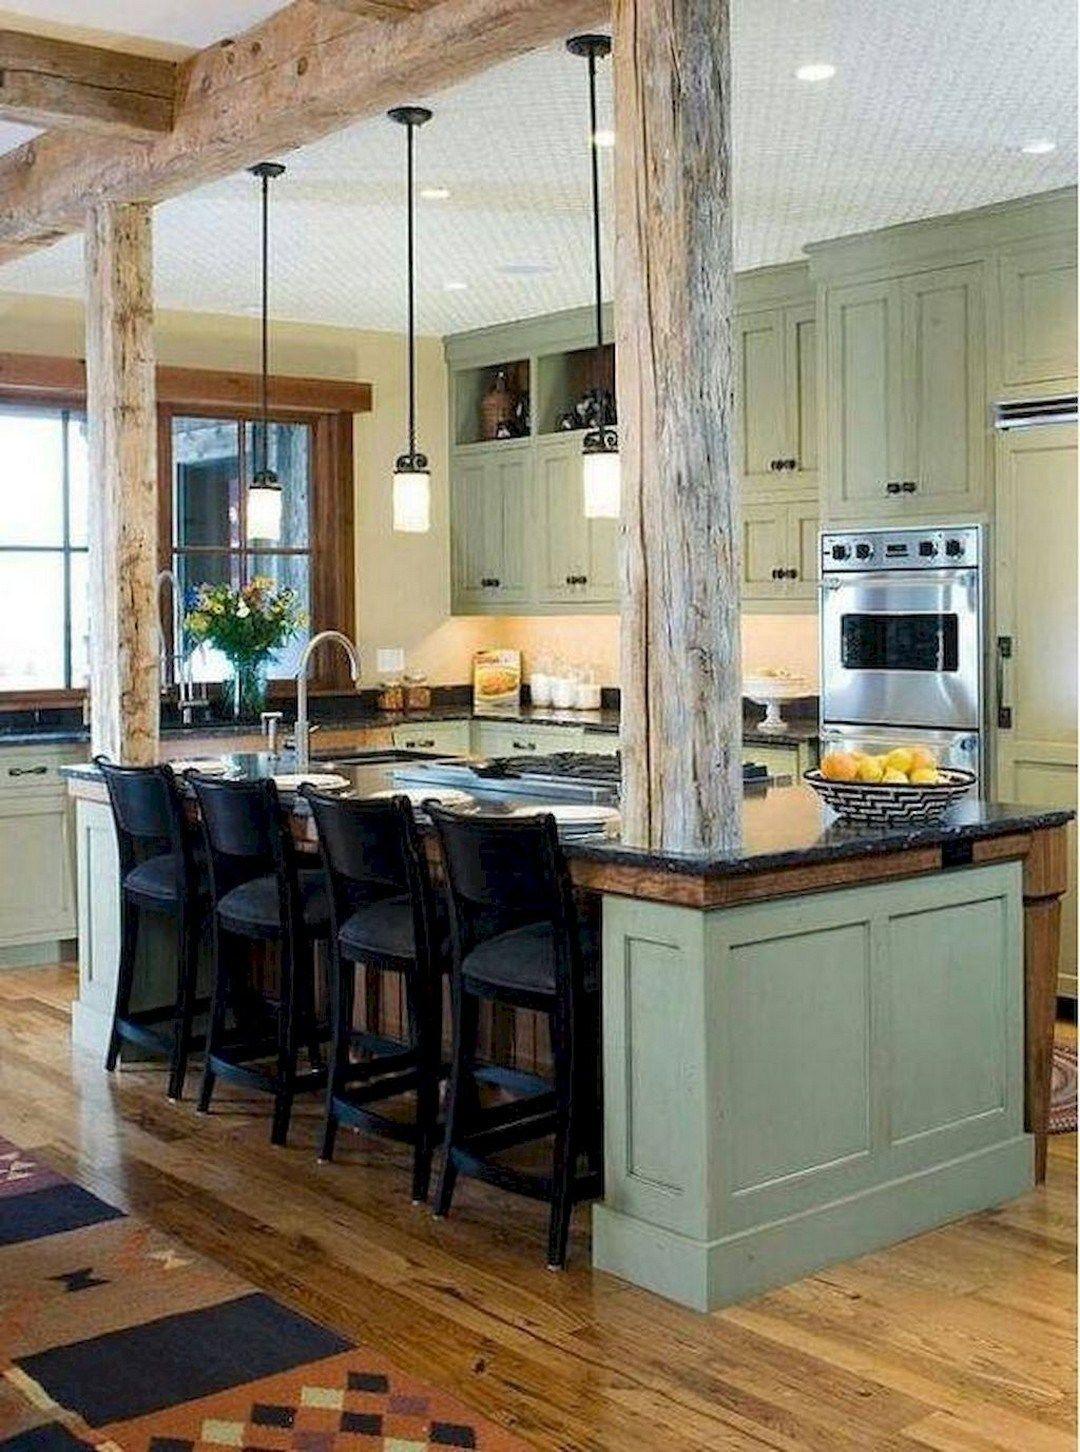 34 kitchen island ideas for inspiration on creating your own dream kitchen farmhouse room on kitchen island ideas diy id=29786